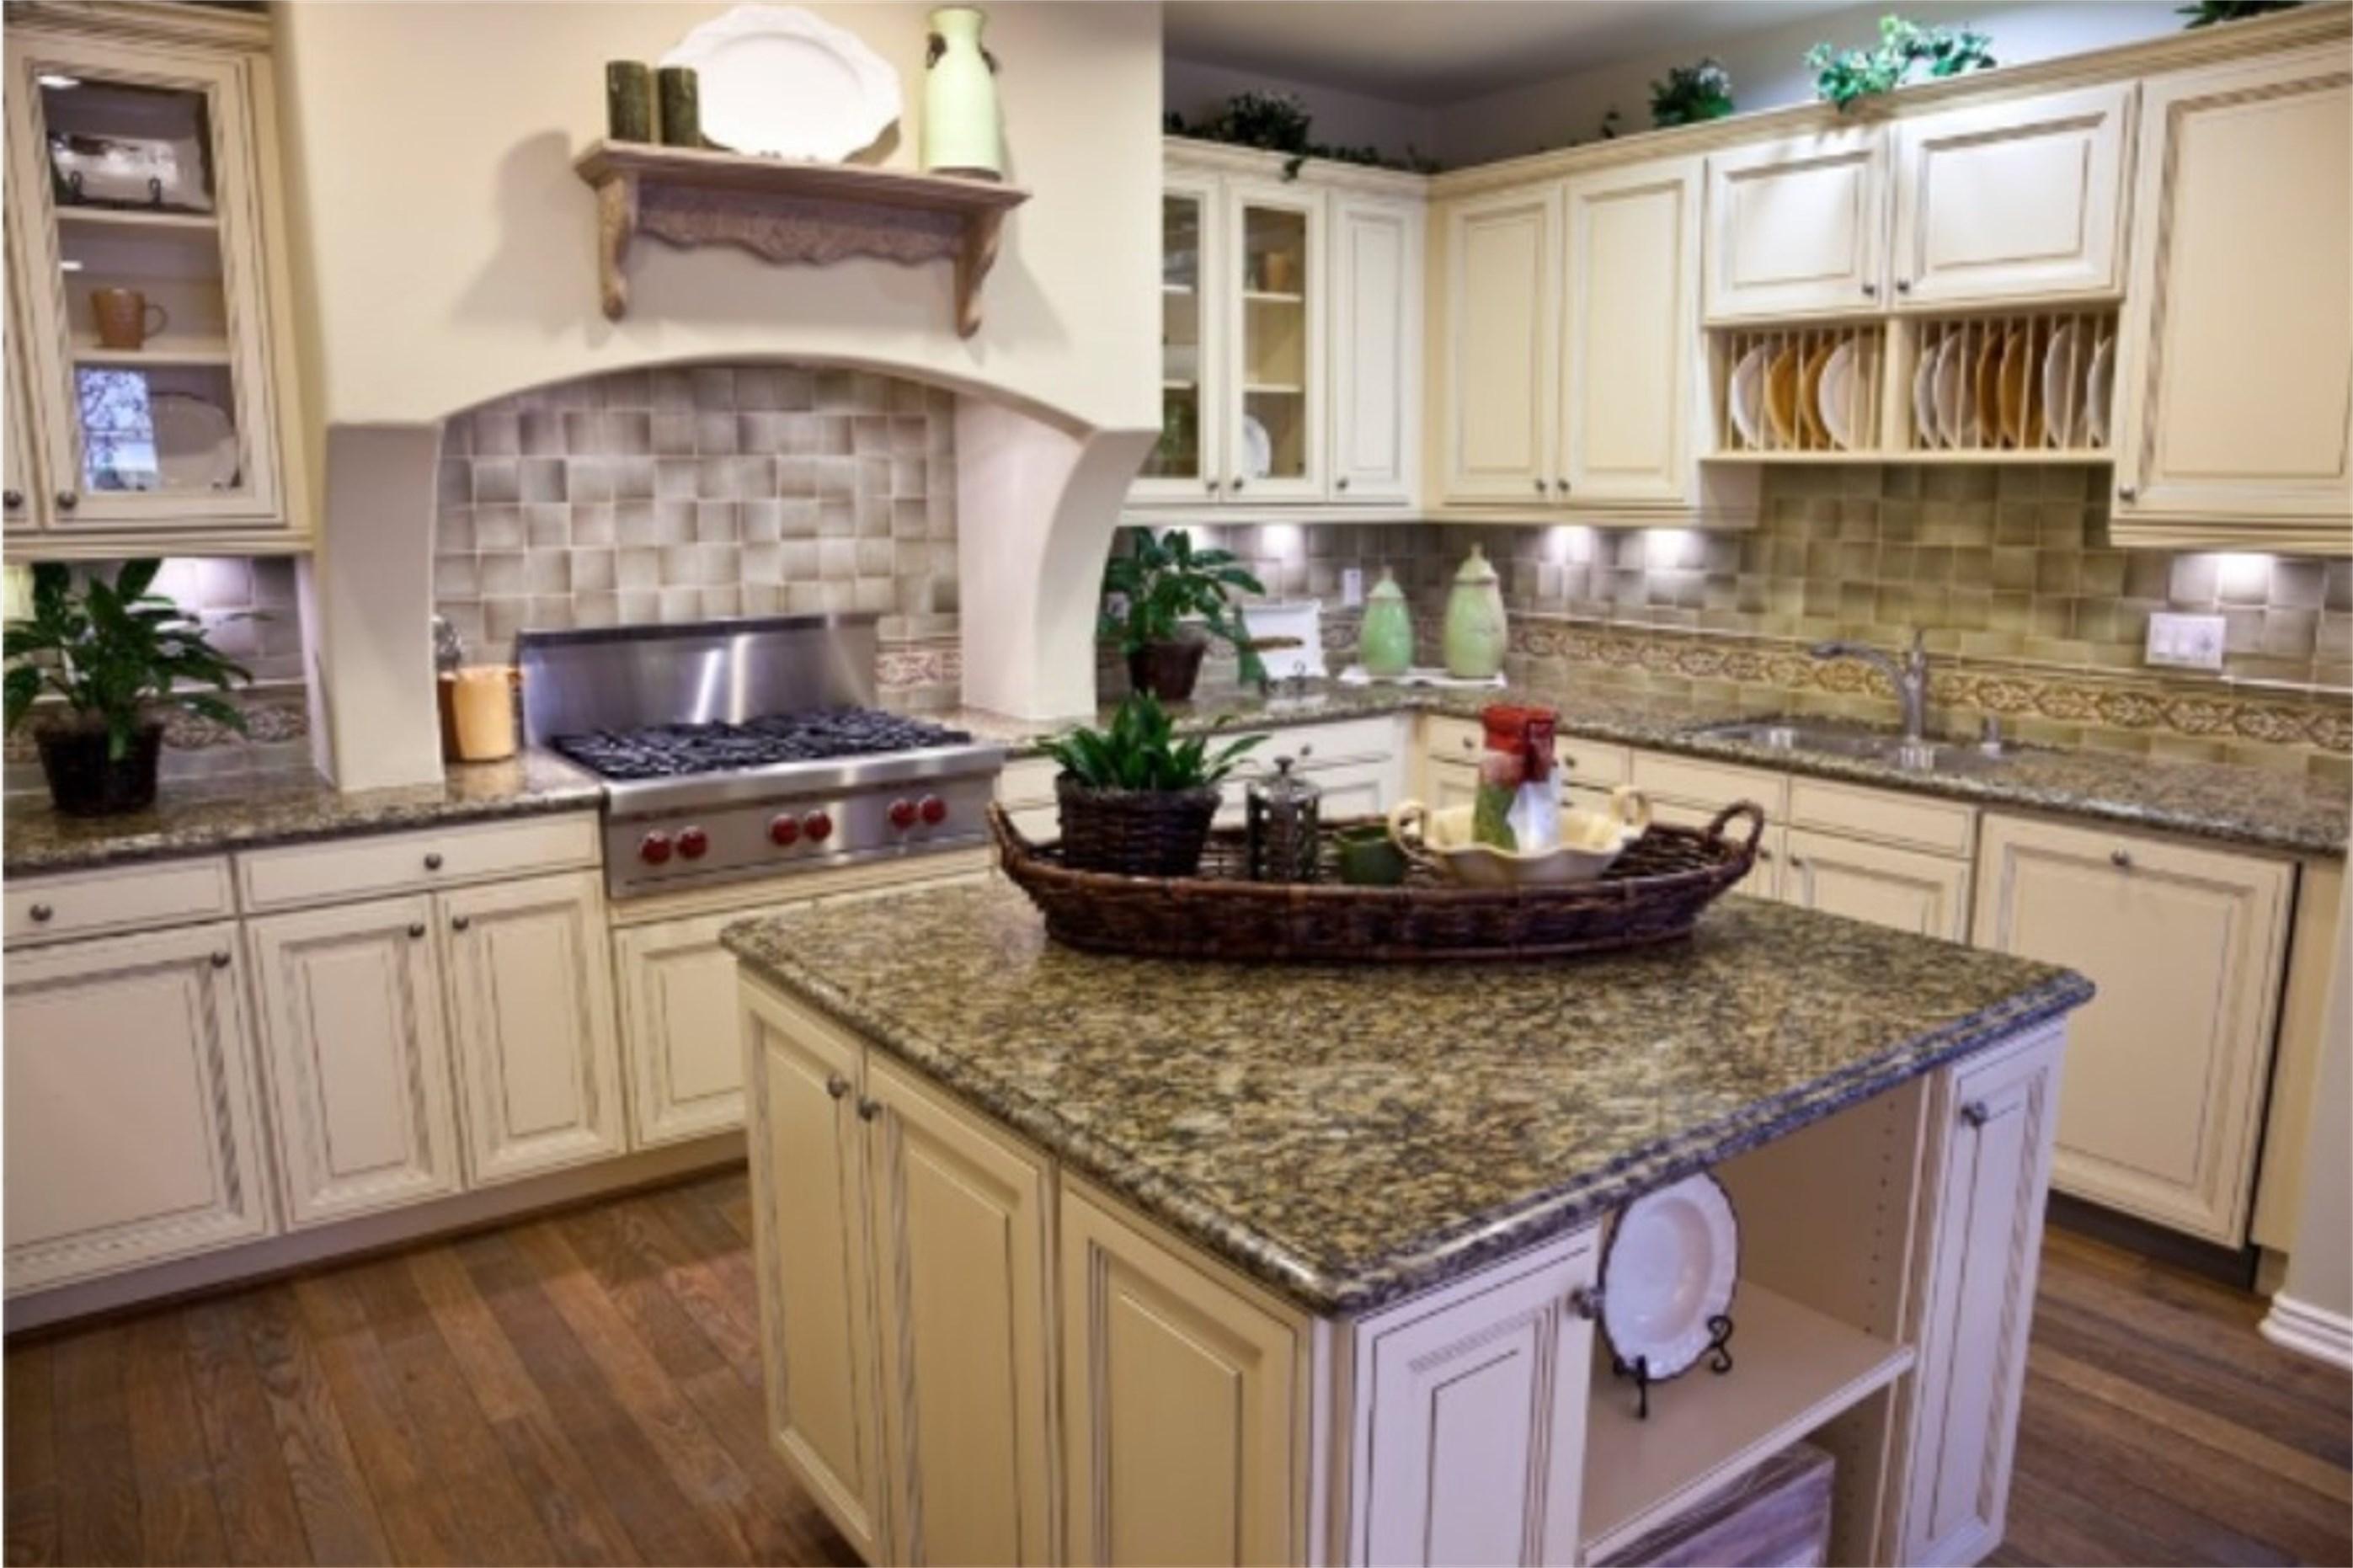 cecelia design photos countertop kitchen installed reviews cecilia and granix santa countertops inc granite finished products